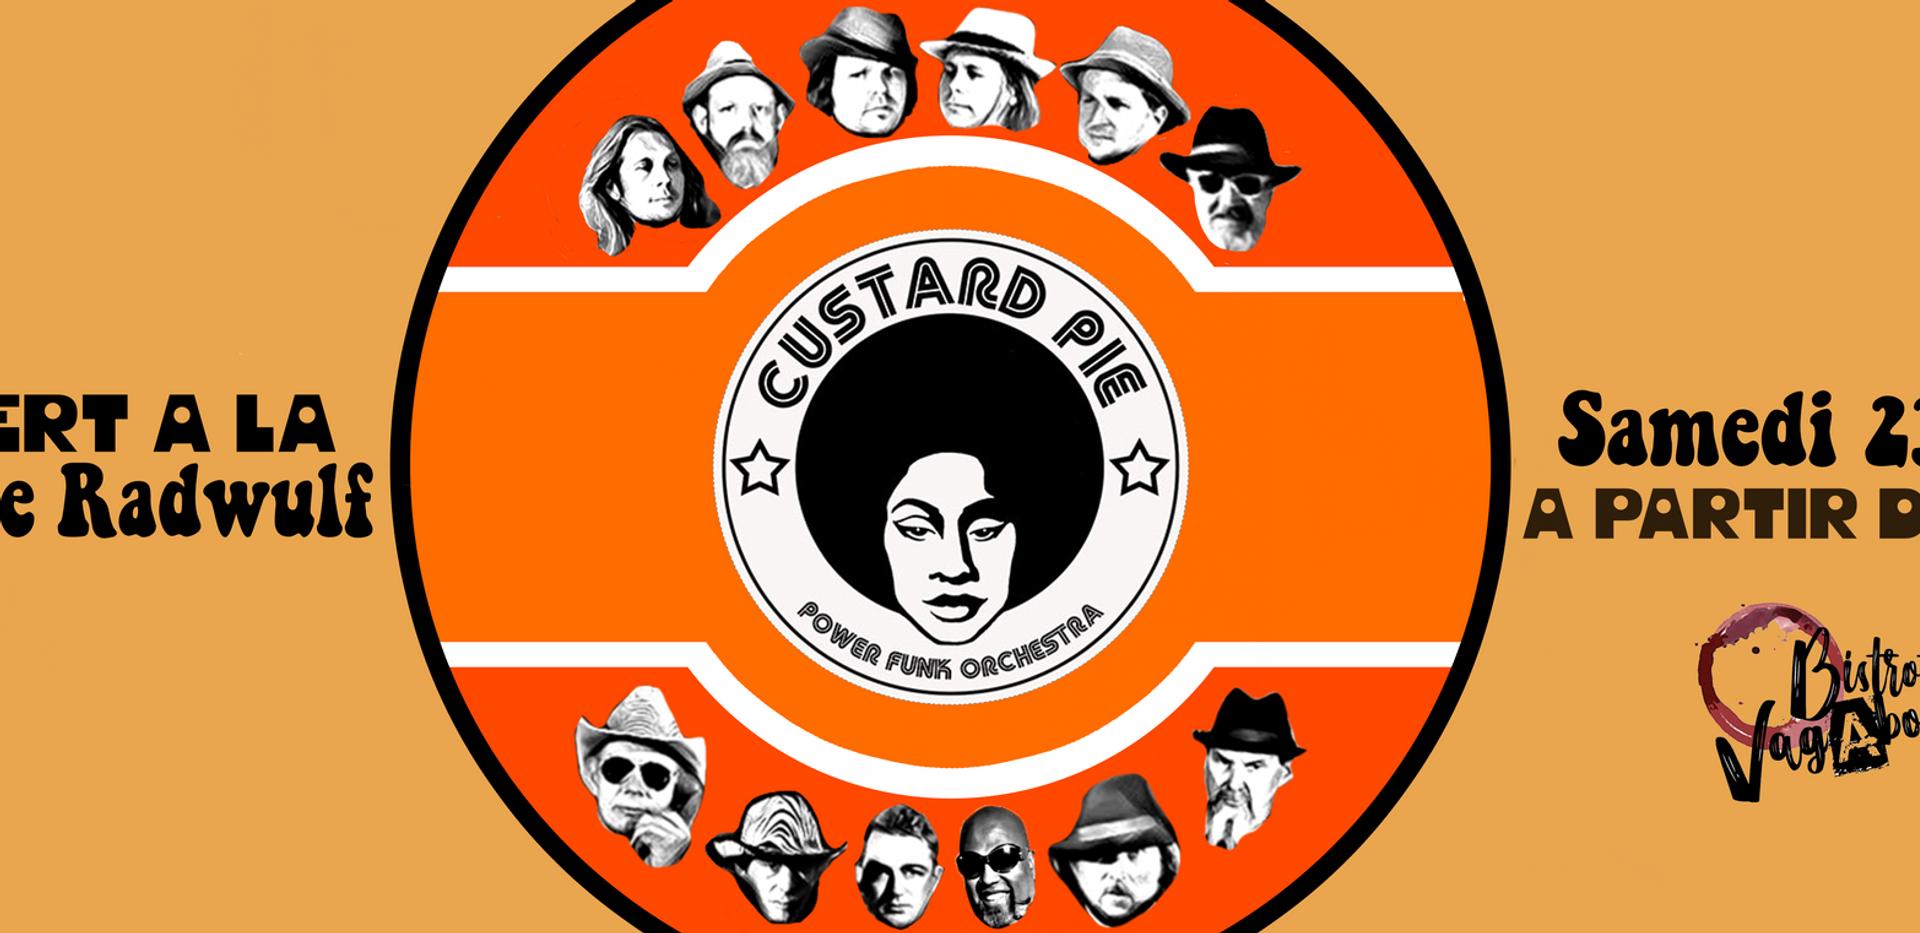 custard pie rond + concert copy.png